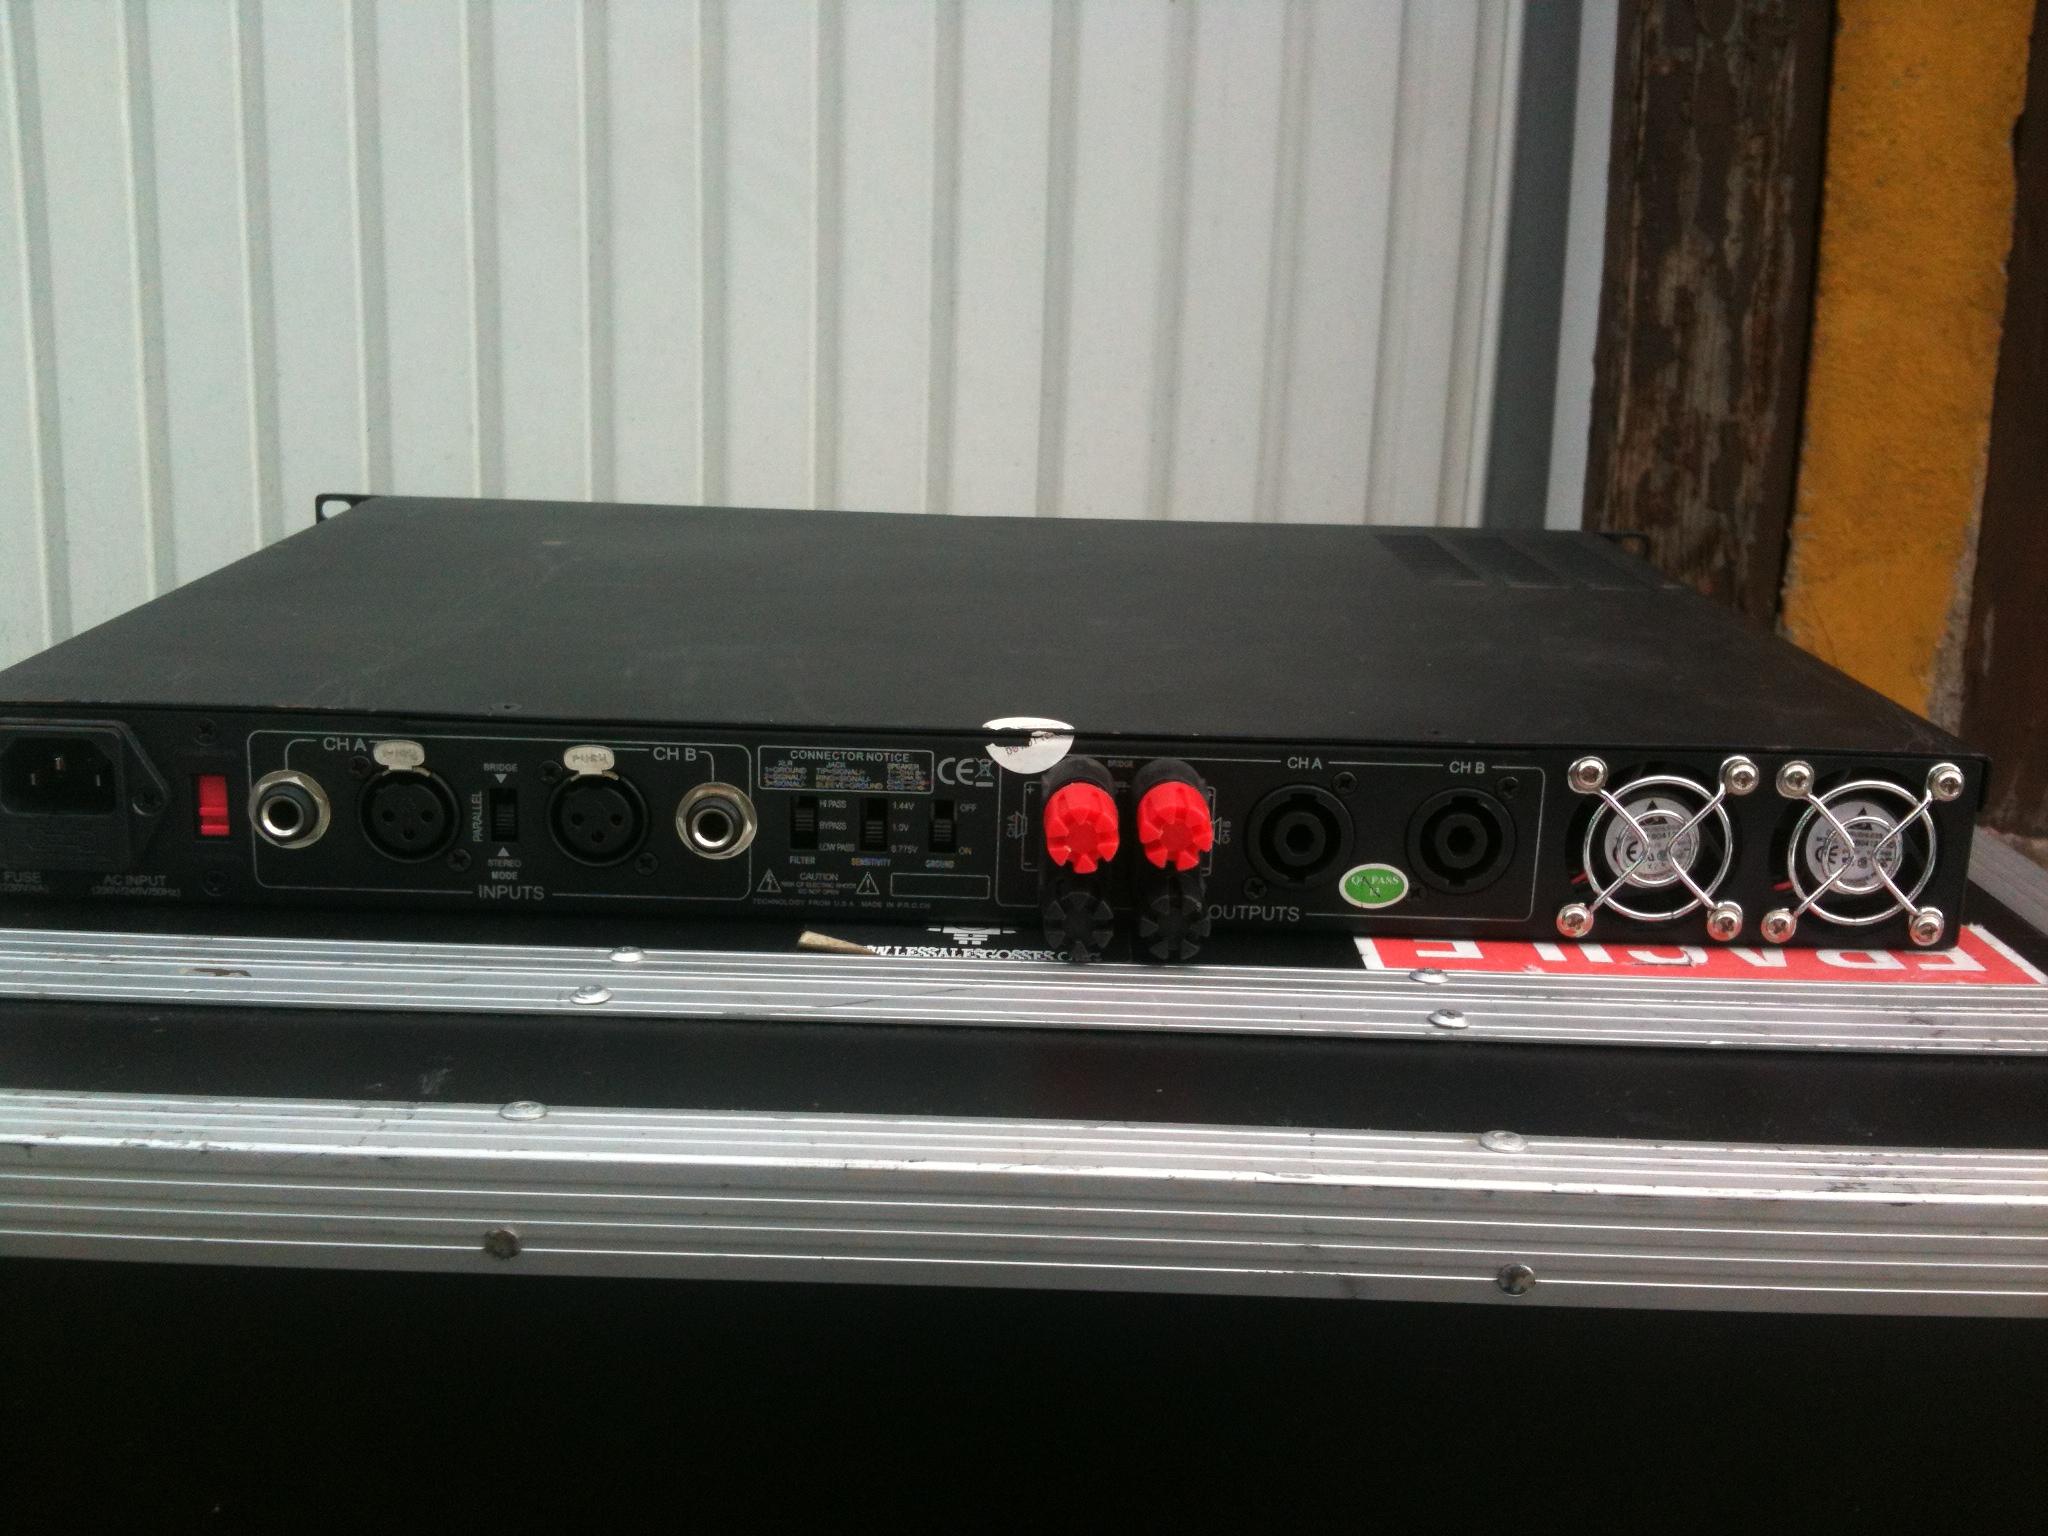 american audio vlp300 image 496697 audiofanzine rh en audiofanzine com american audio vlp 300 service manual american audio vlp300 power amplifier manual